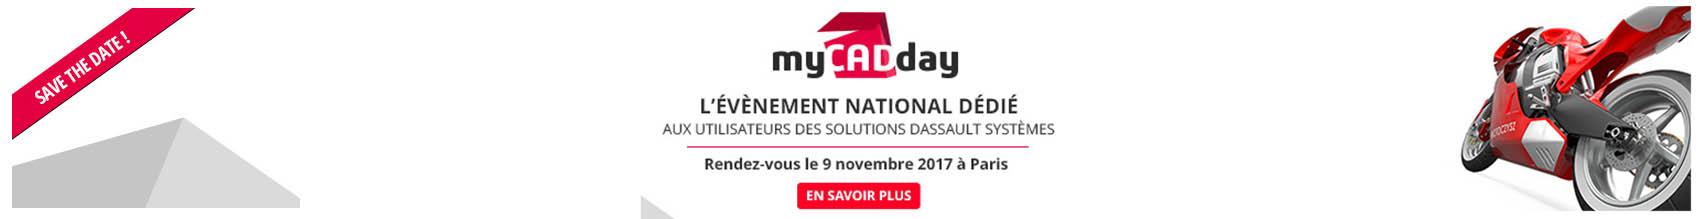 myCADday2017_TechViz_Event banner